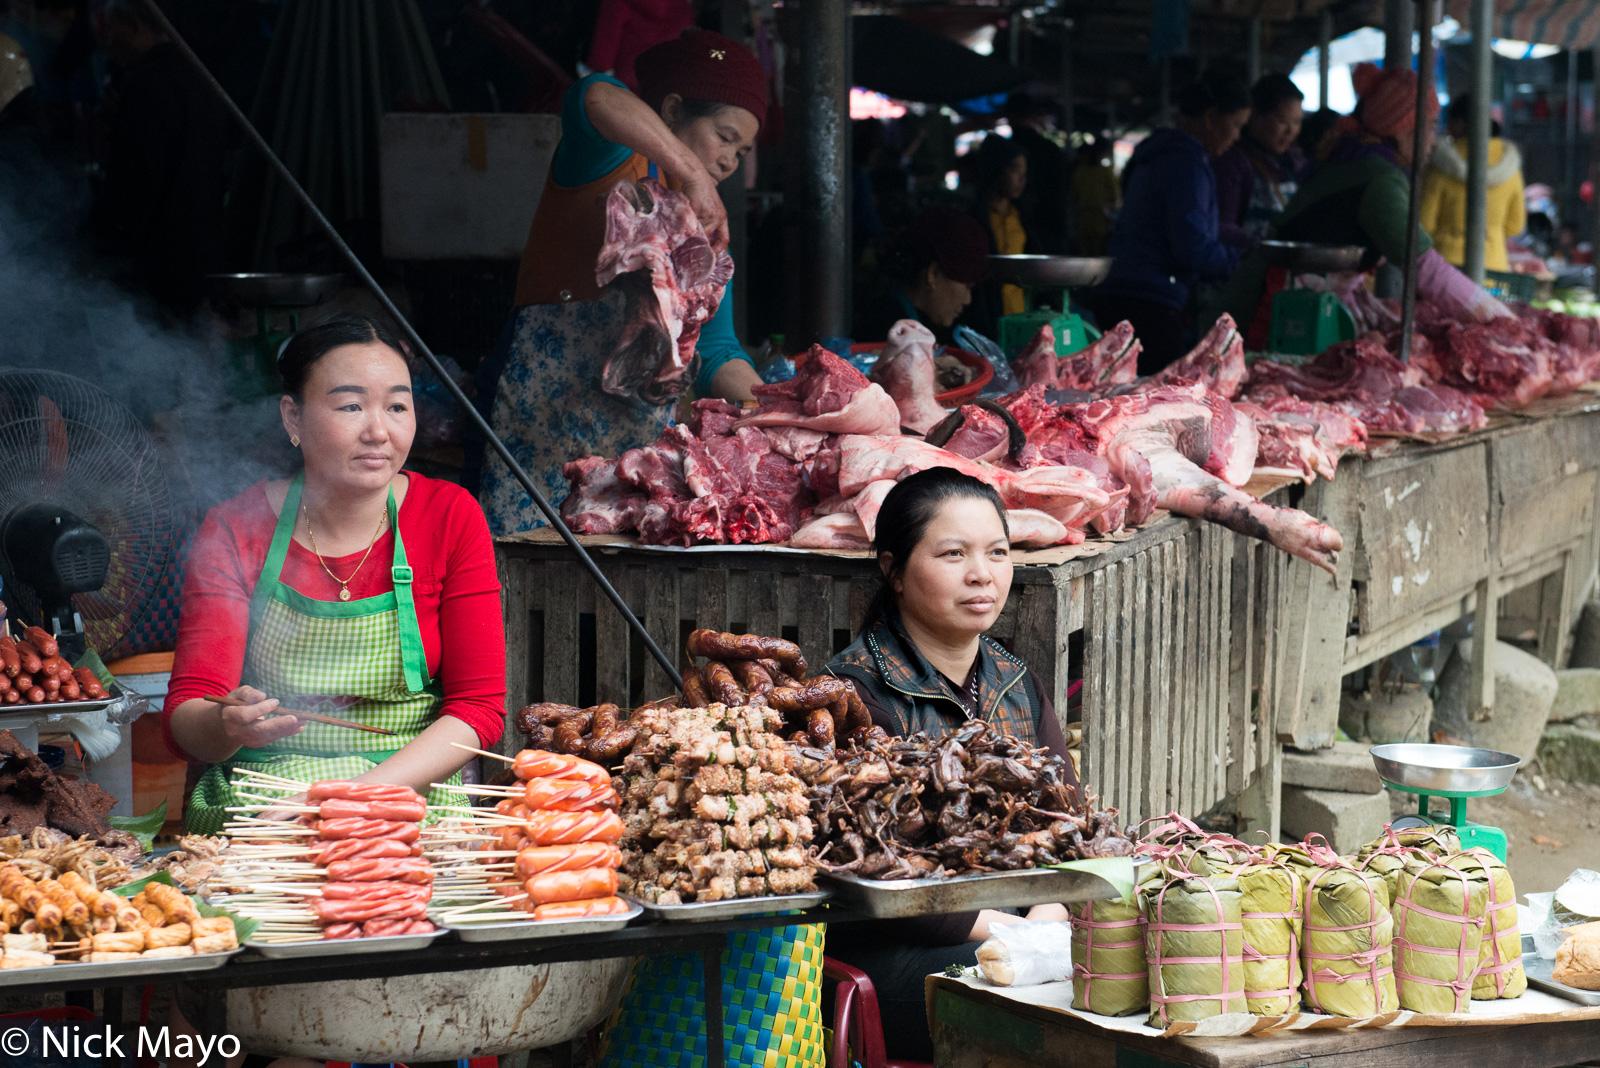 Lai Chau, Market, Meat, Selling, Vietnam, photo